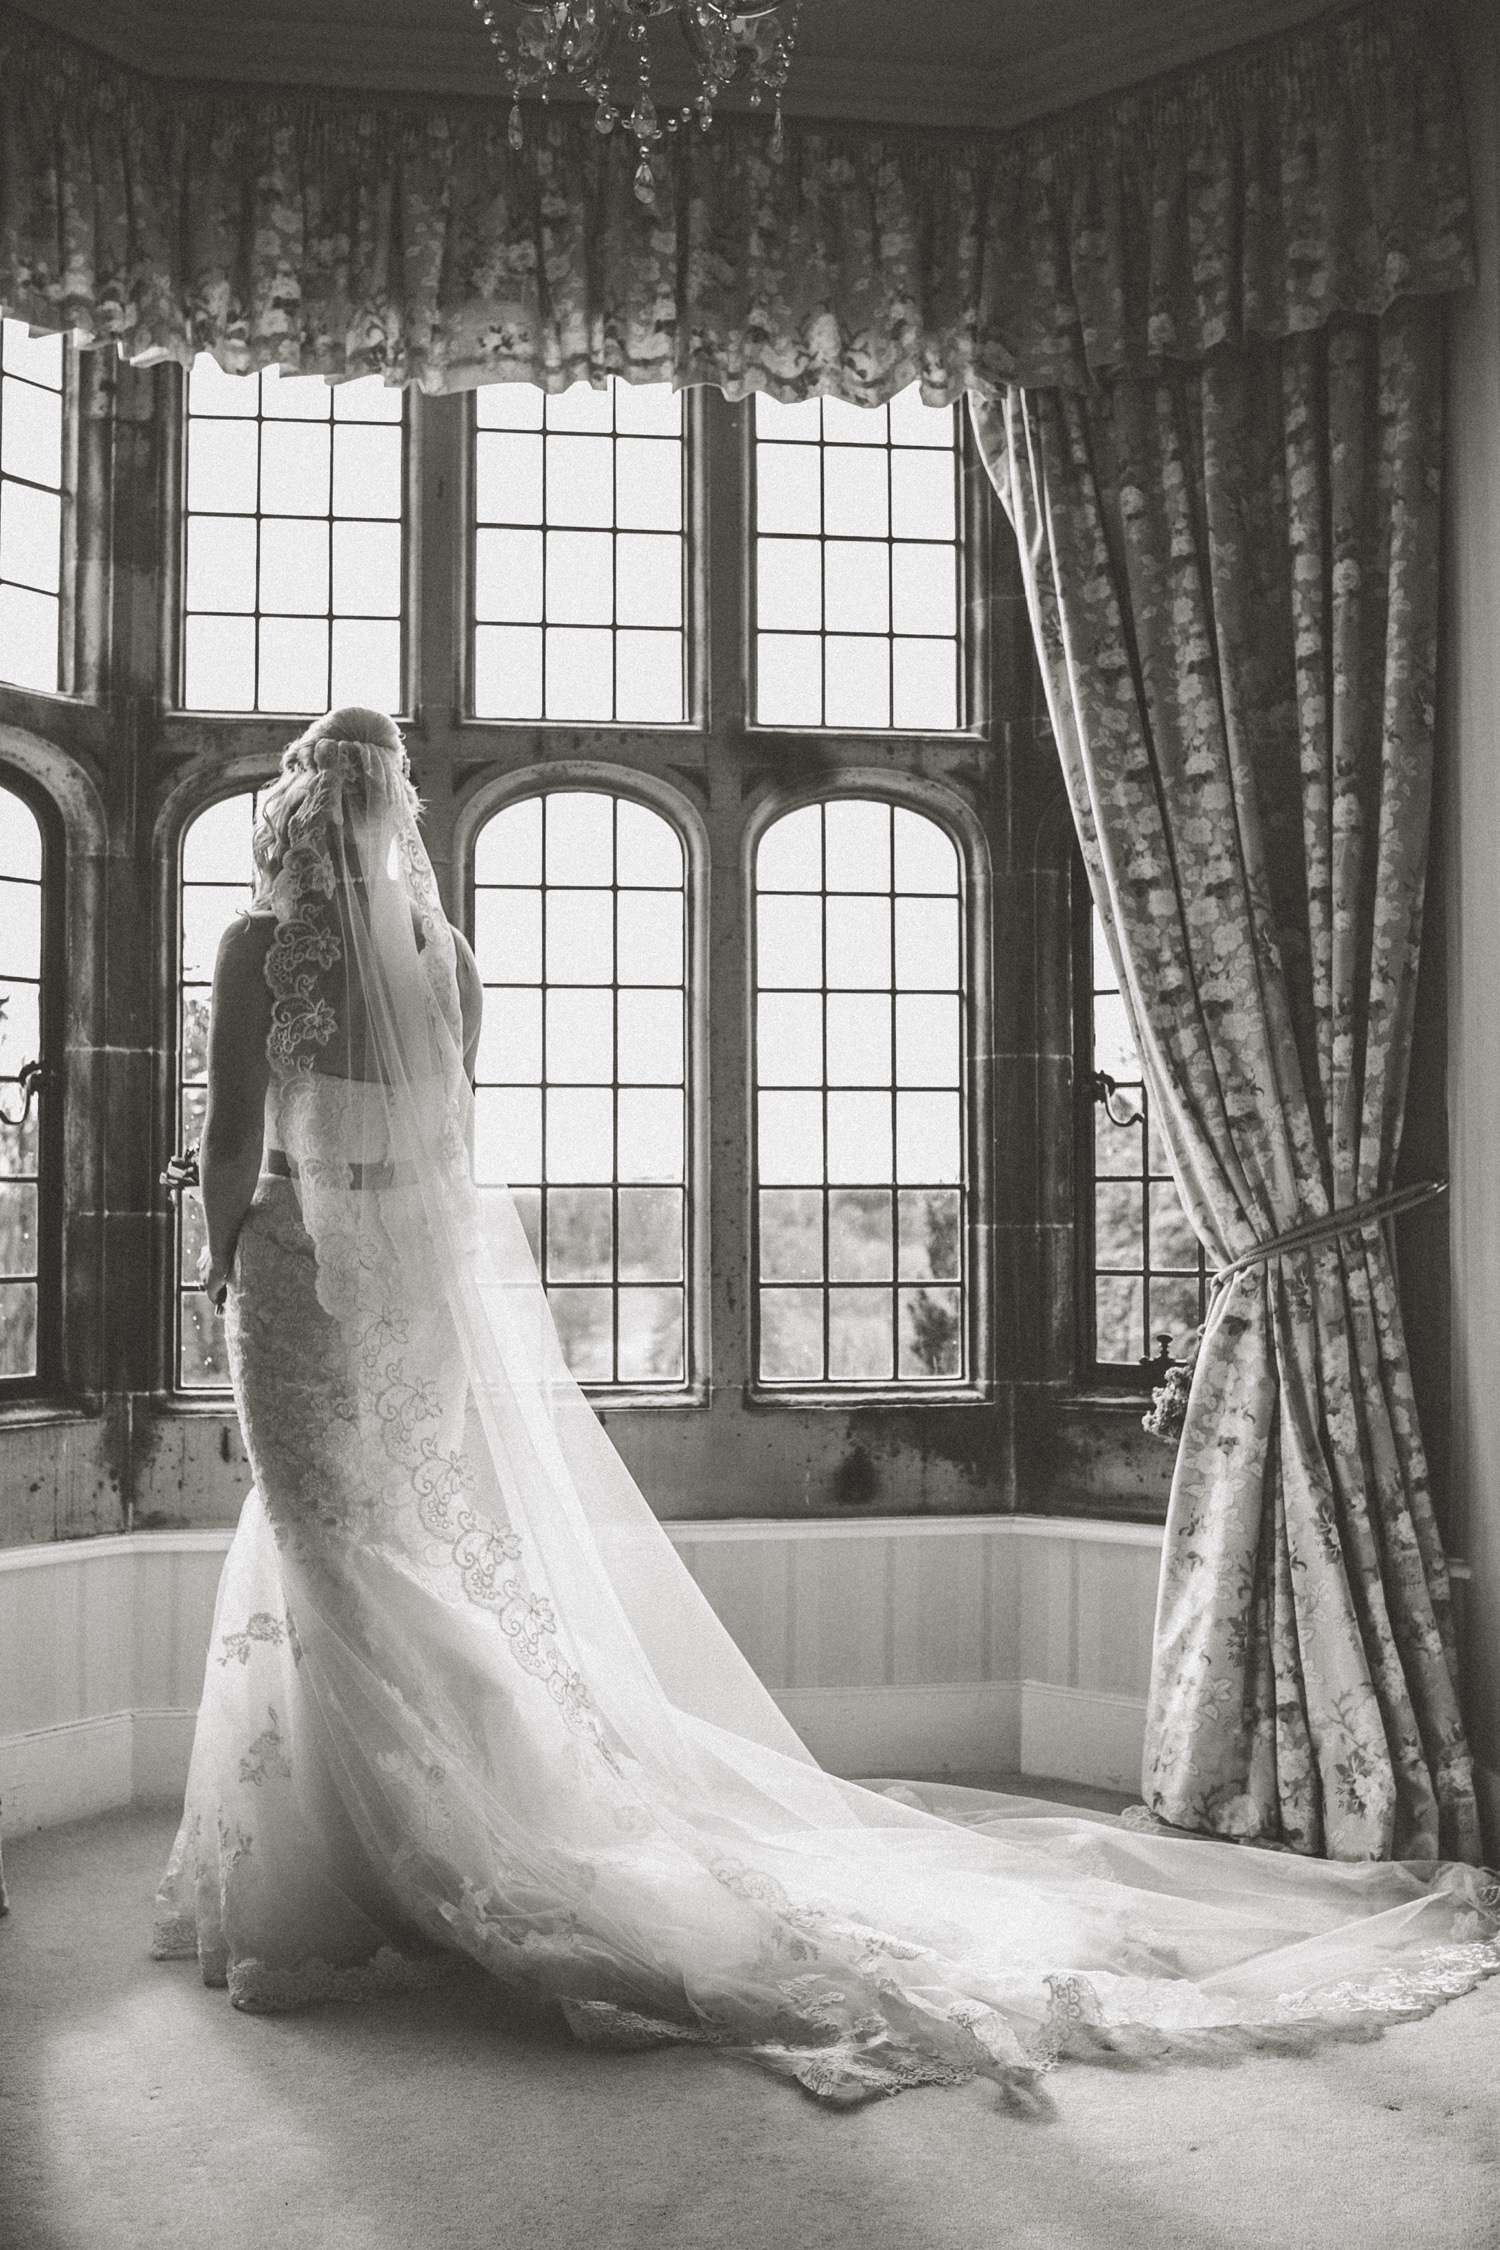 The Stylish Bride // Fay Andrews 25 Mar  Guyzance Hall